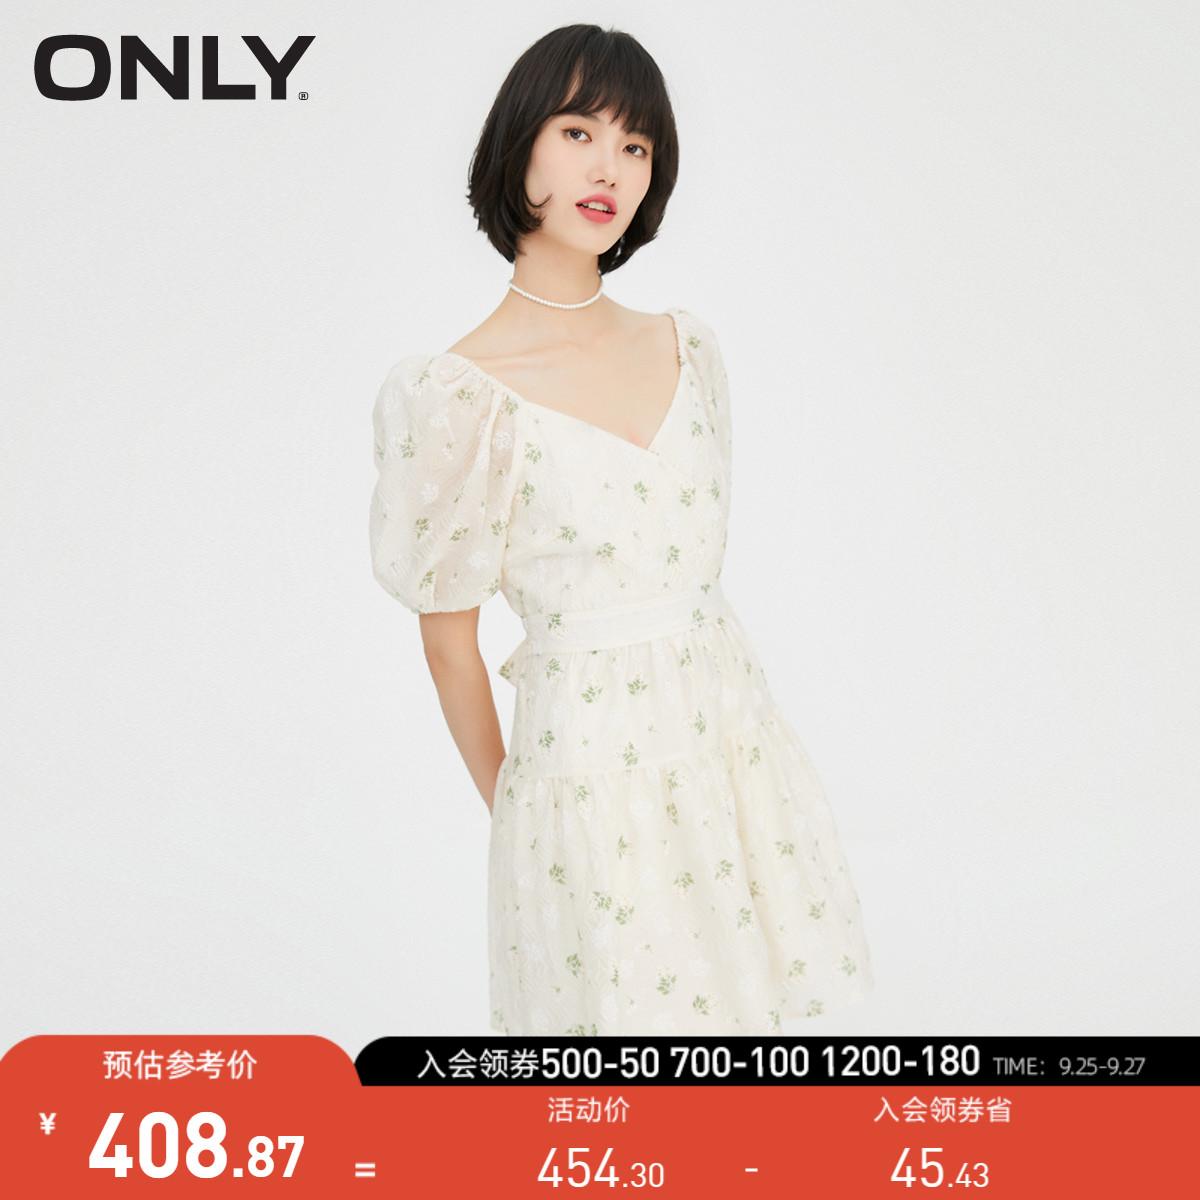 ONLY2021秋季新款碎花图案V领泡泡袖设计系带连衣裙女 121307039